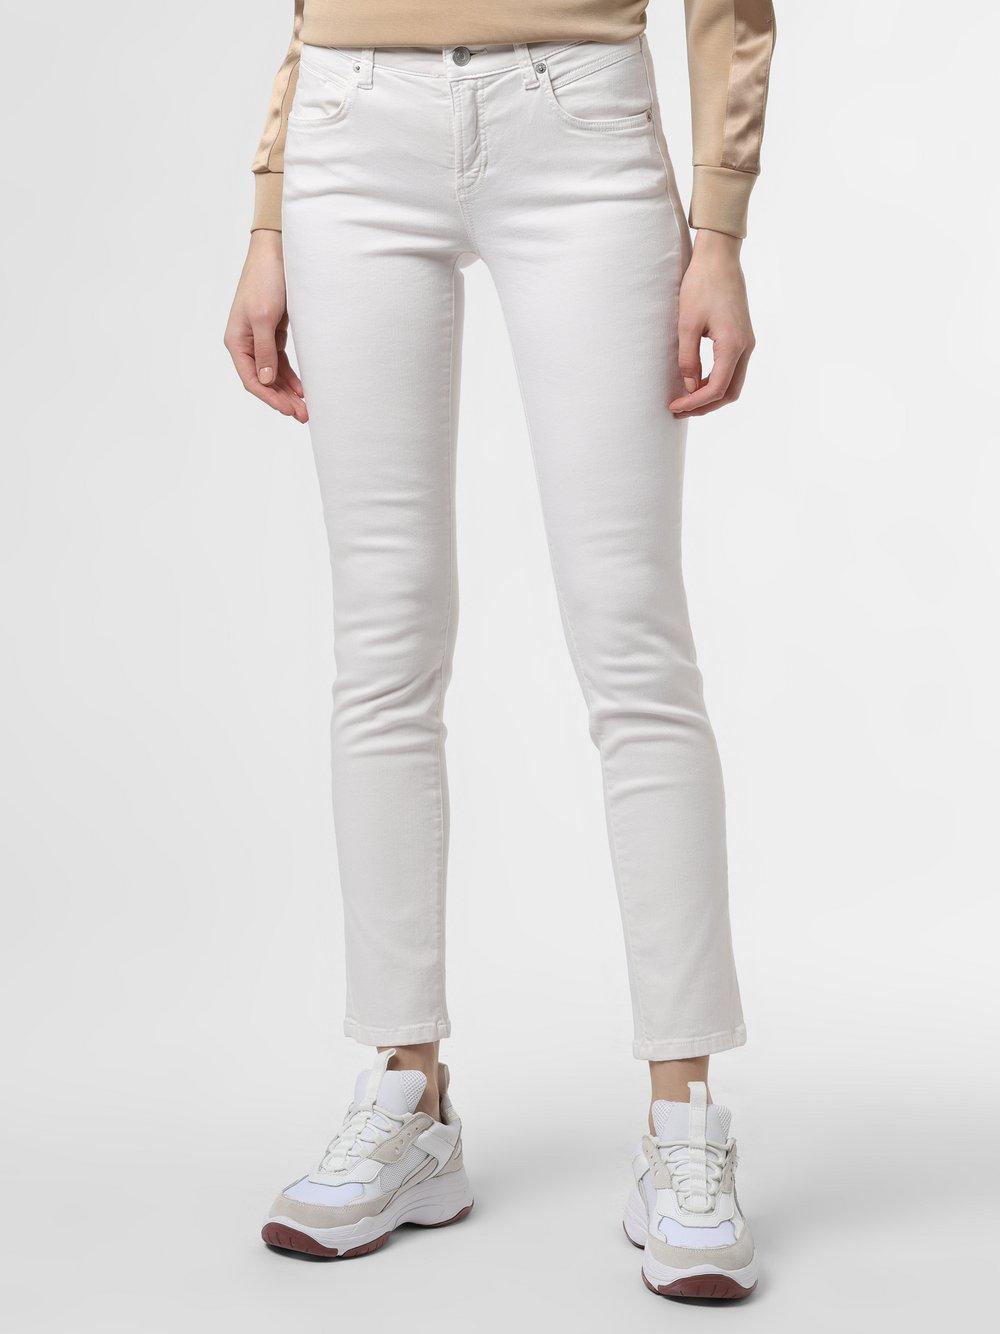 Cambio - Spodnie damskie – Pina, beżowy